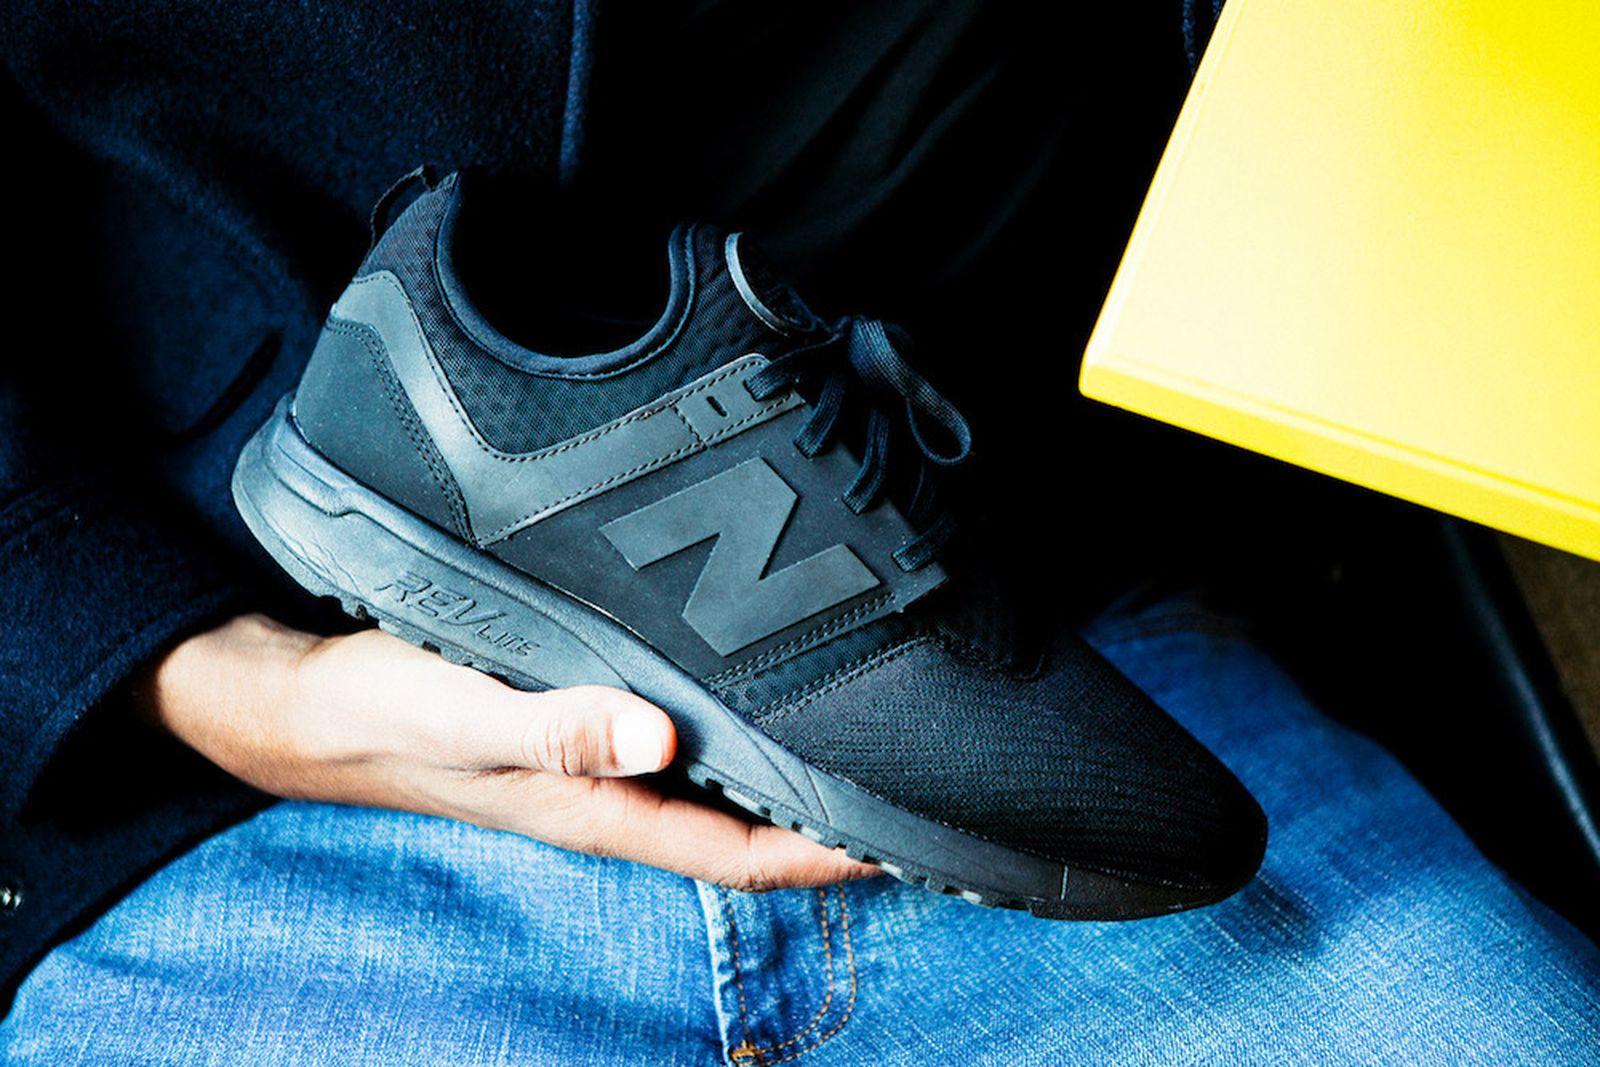 New-Balance-247-Sport-Lookbook-55